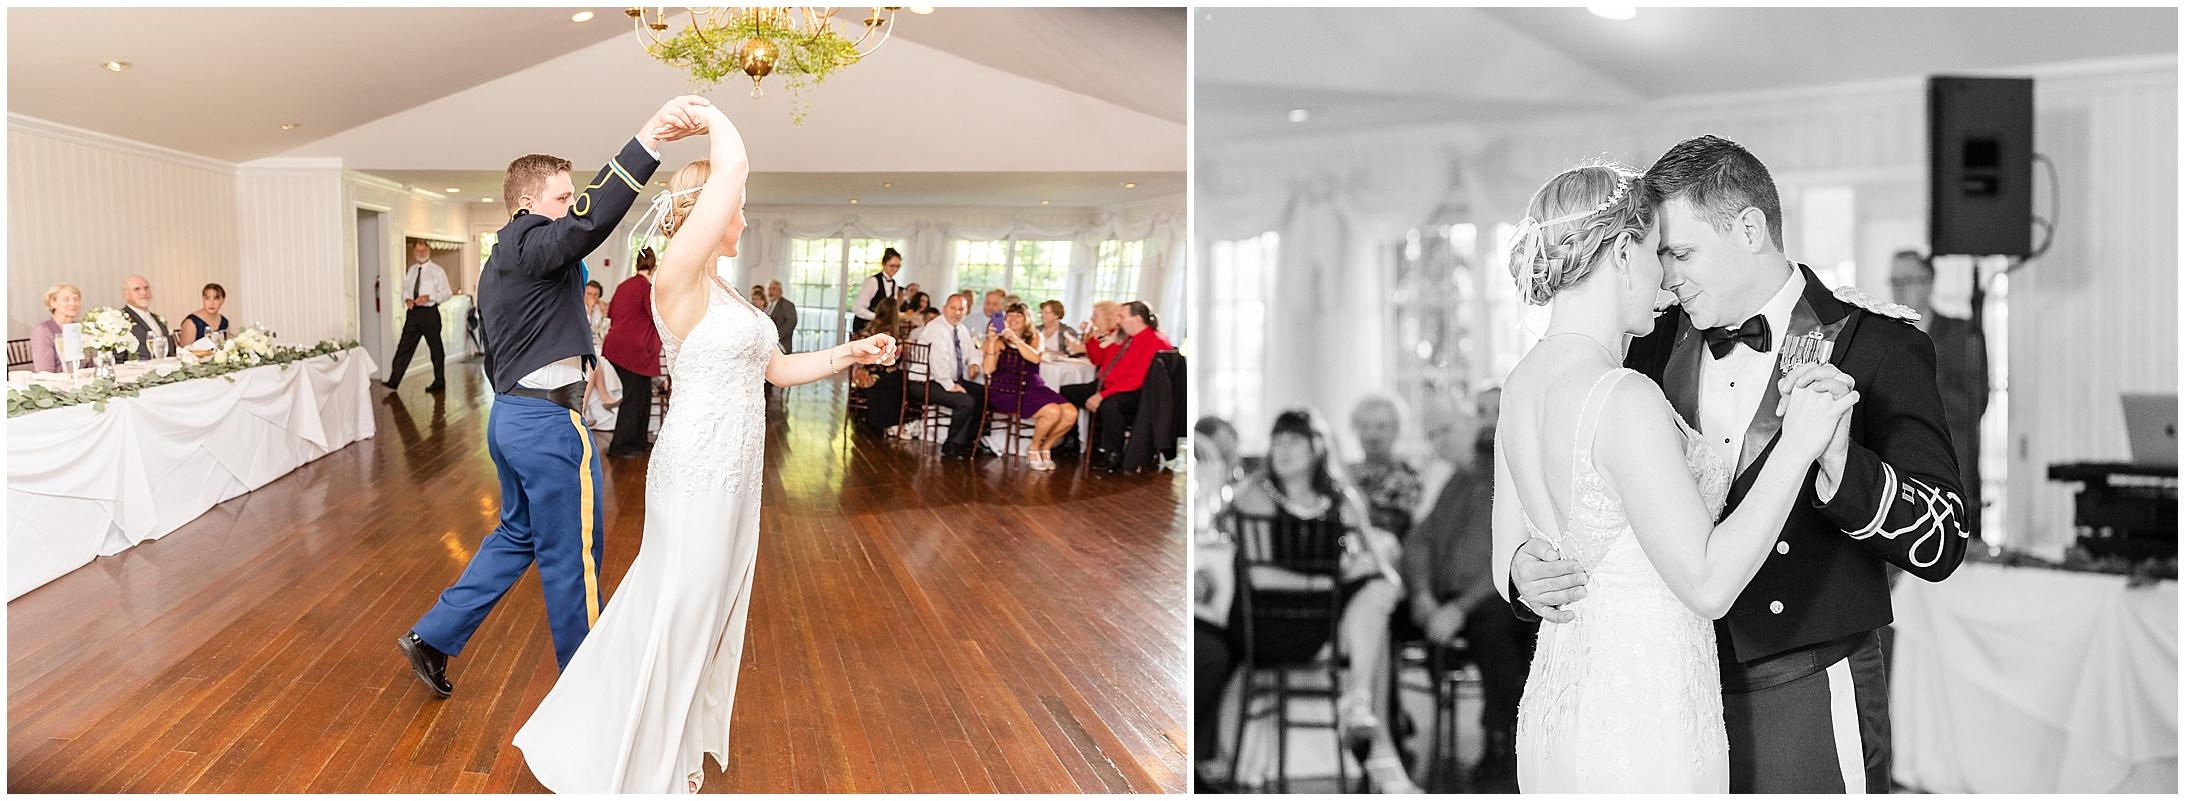 Antrim-1844-wedding-photos_0467.jpg